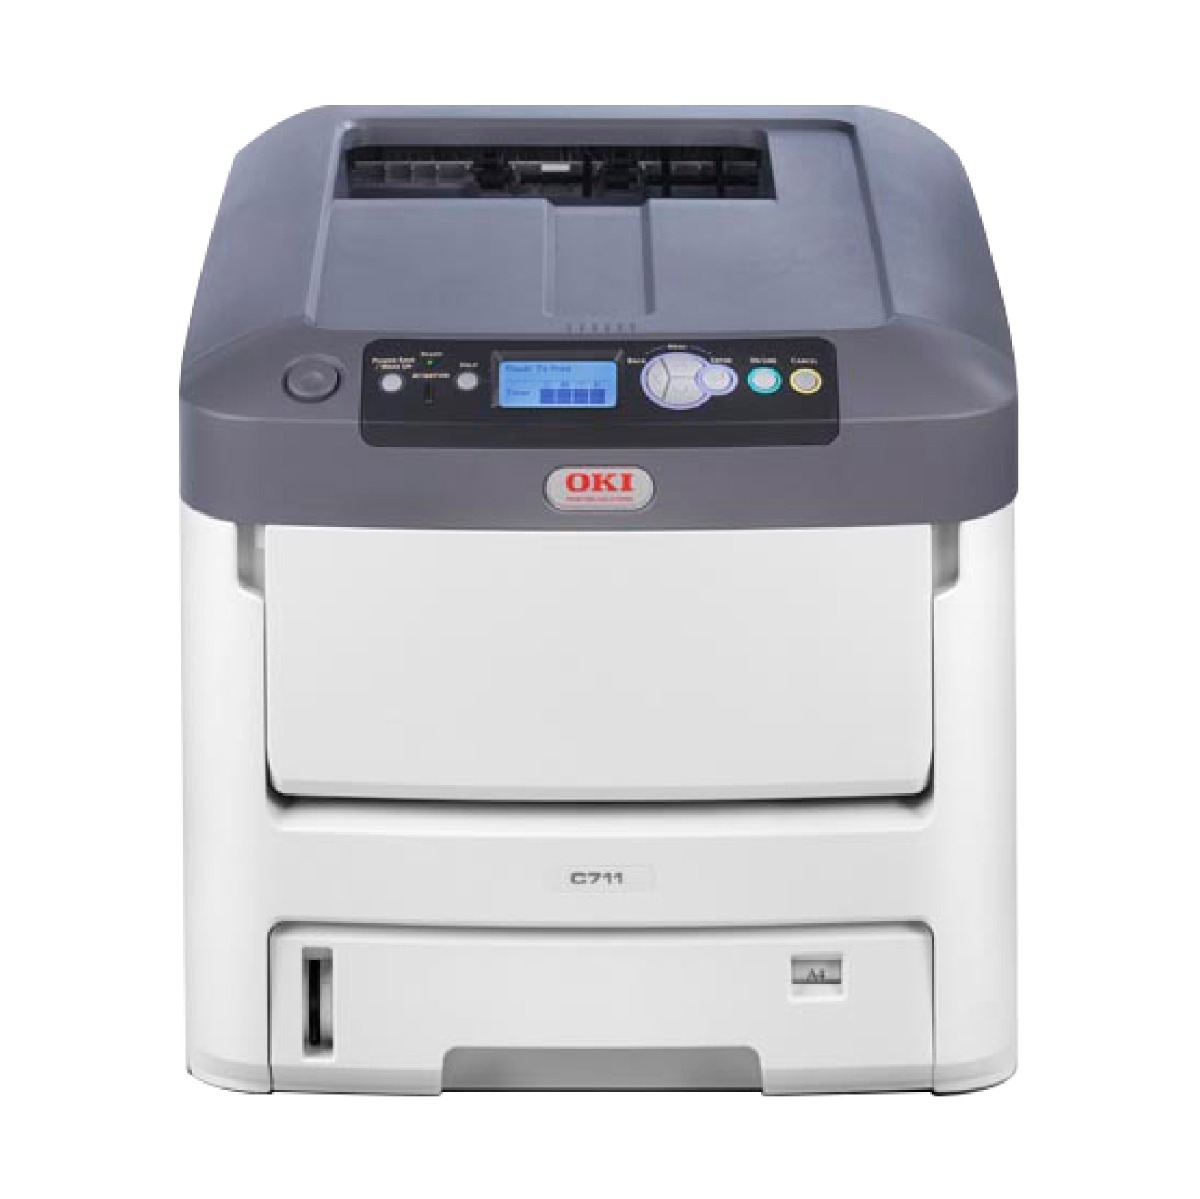 Impresora Láser Color Led Oki C711dn 34ppm A4 - $ 29.999,00 en ...